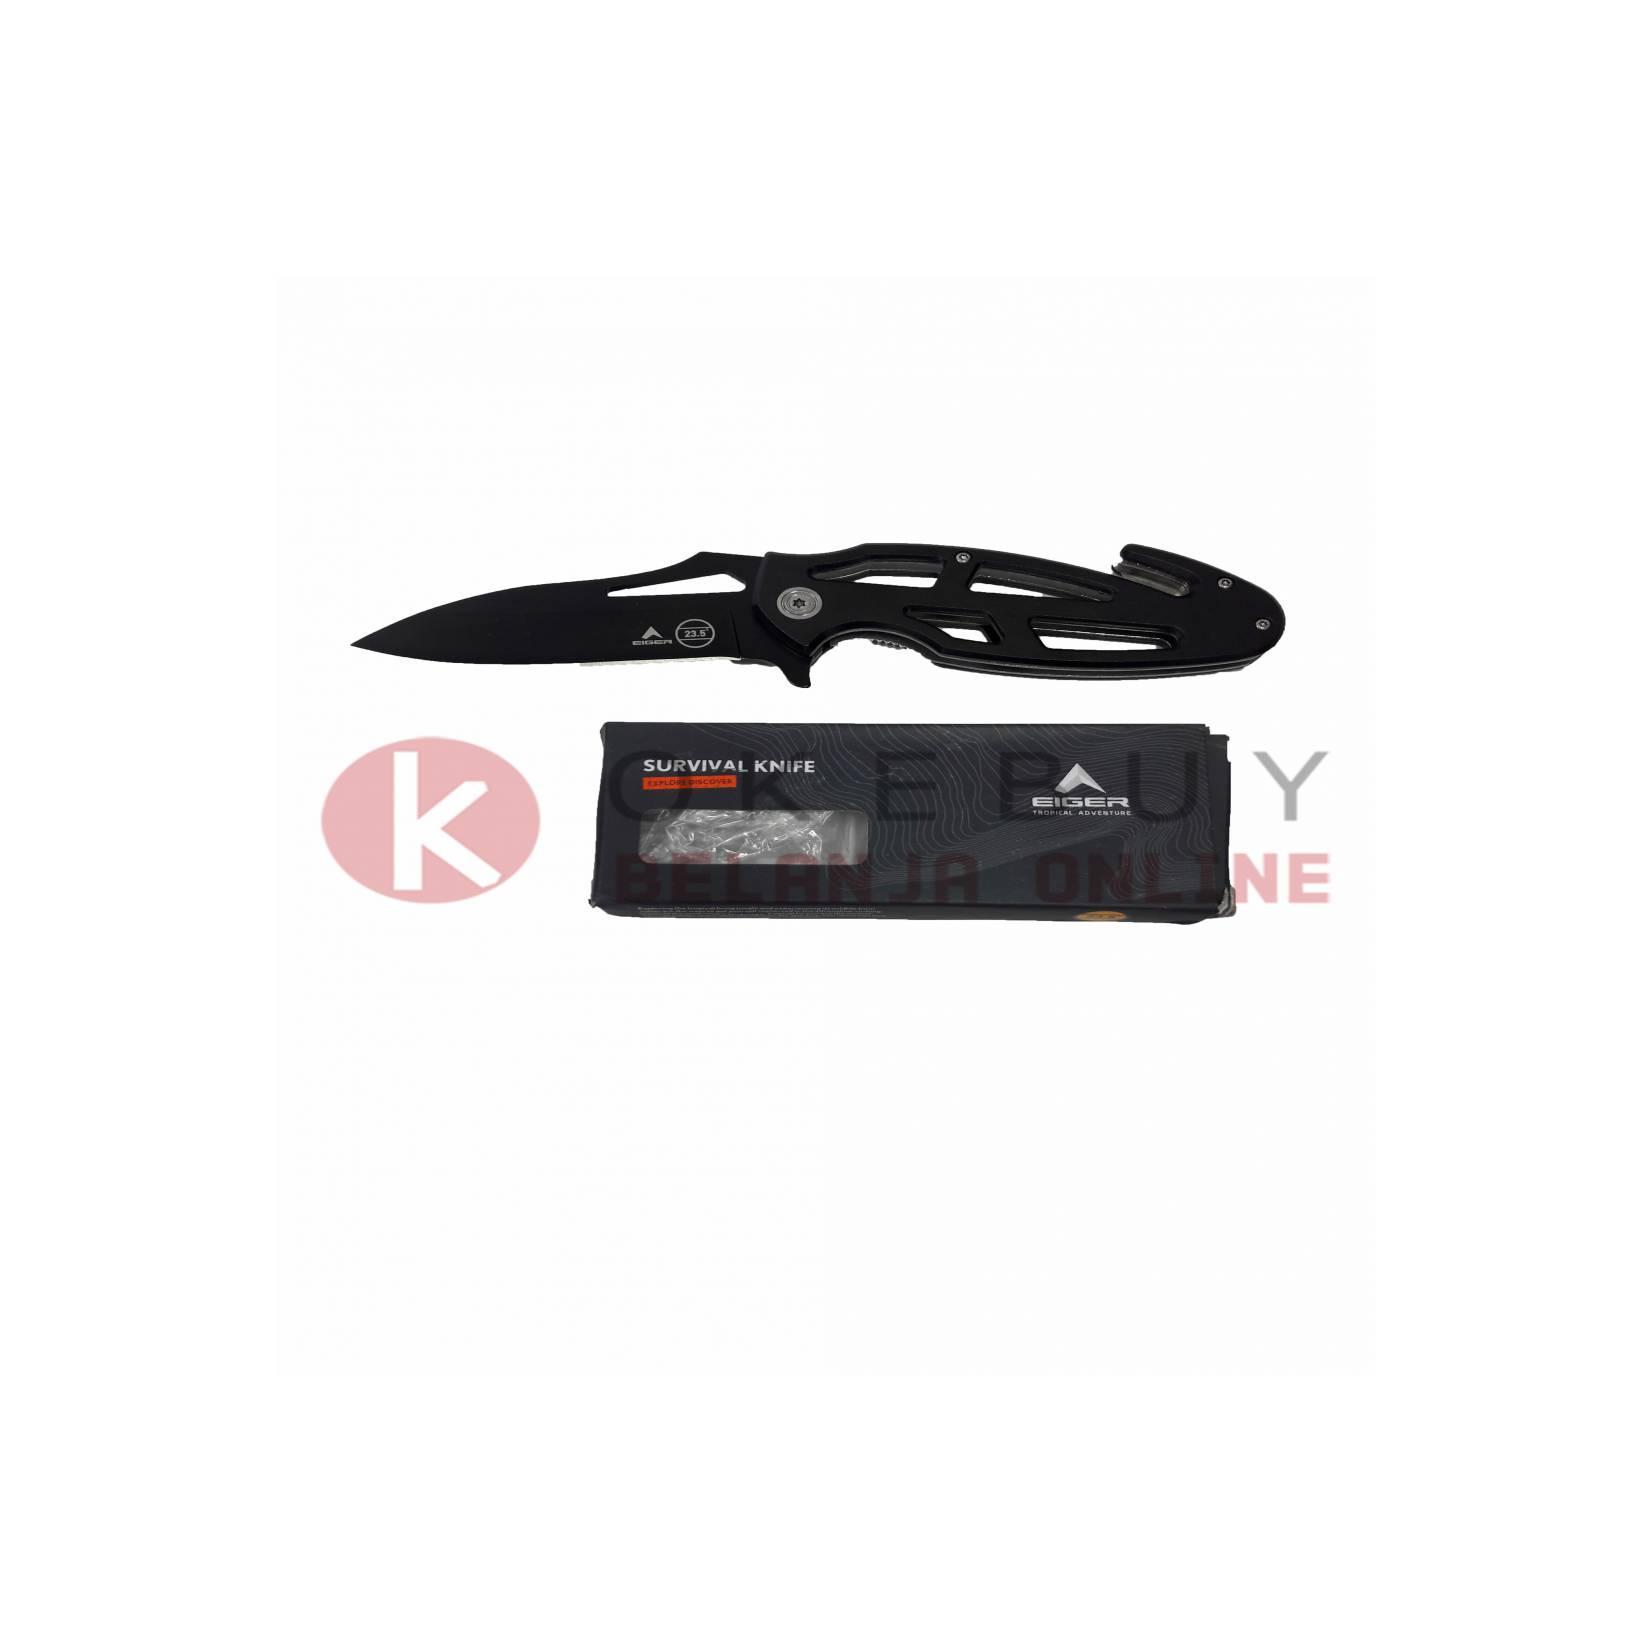 Pisau Lipat Eiger P323 SKELETON KNIFE 3658 ORIGINAL